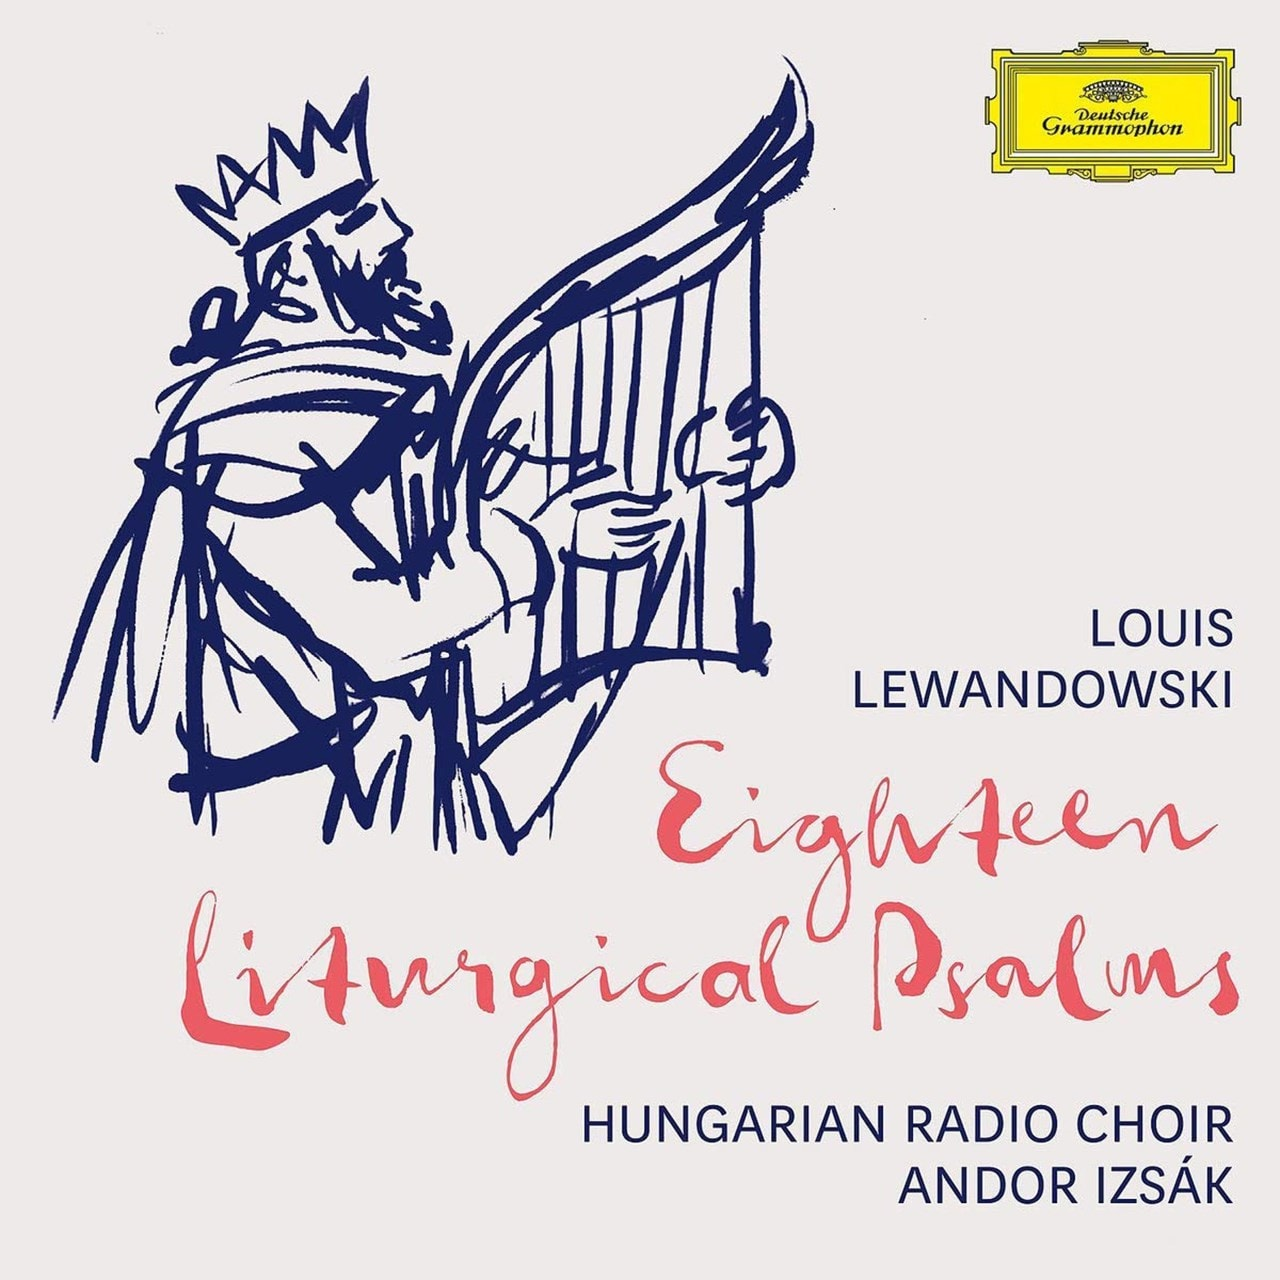 Louis Lewandowski: Eighteen Liturgical Psalms - 1